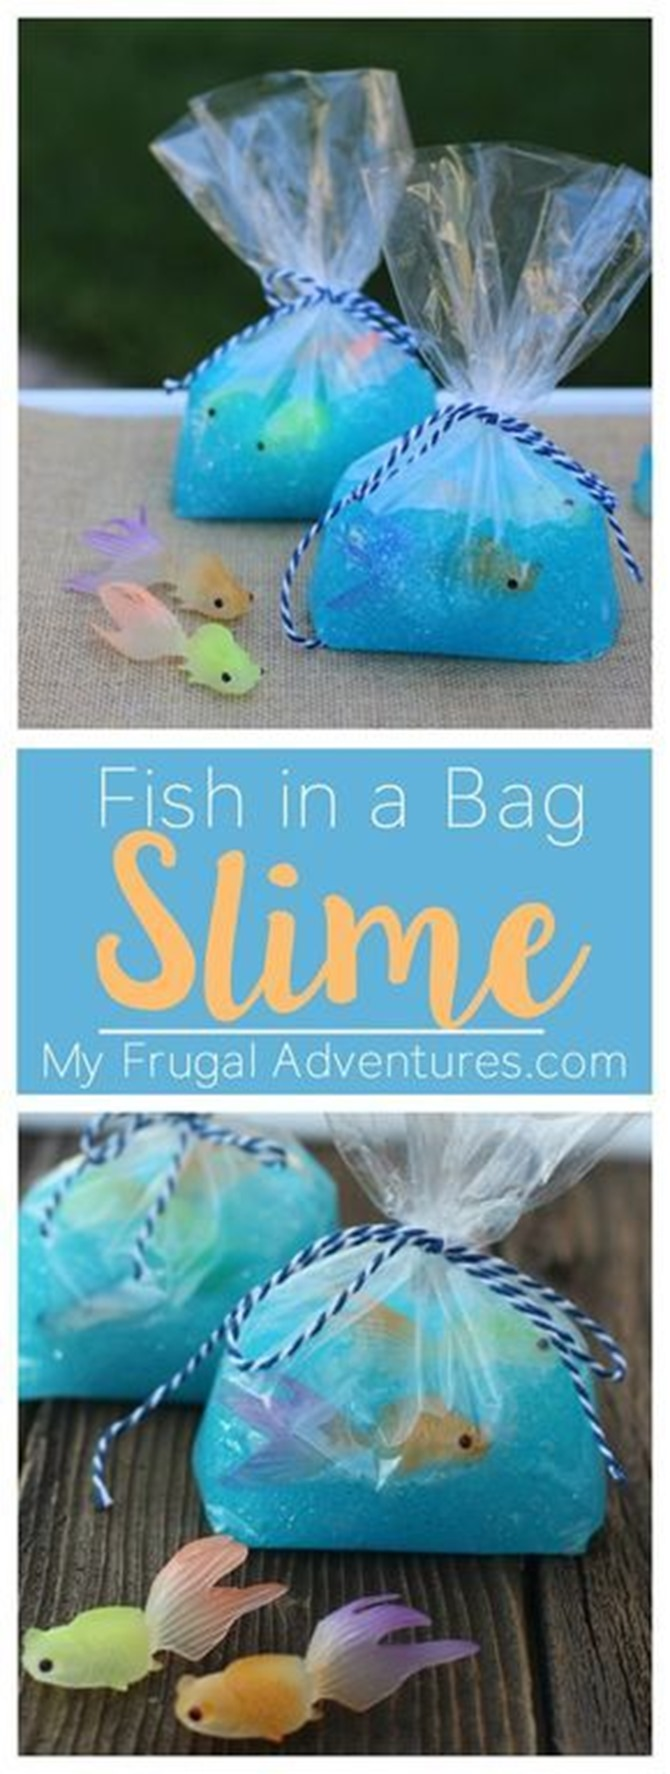 12 DIY Slime Recipes - Fish in a Bag Tutorial